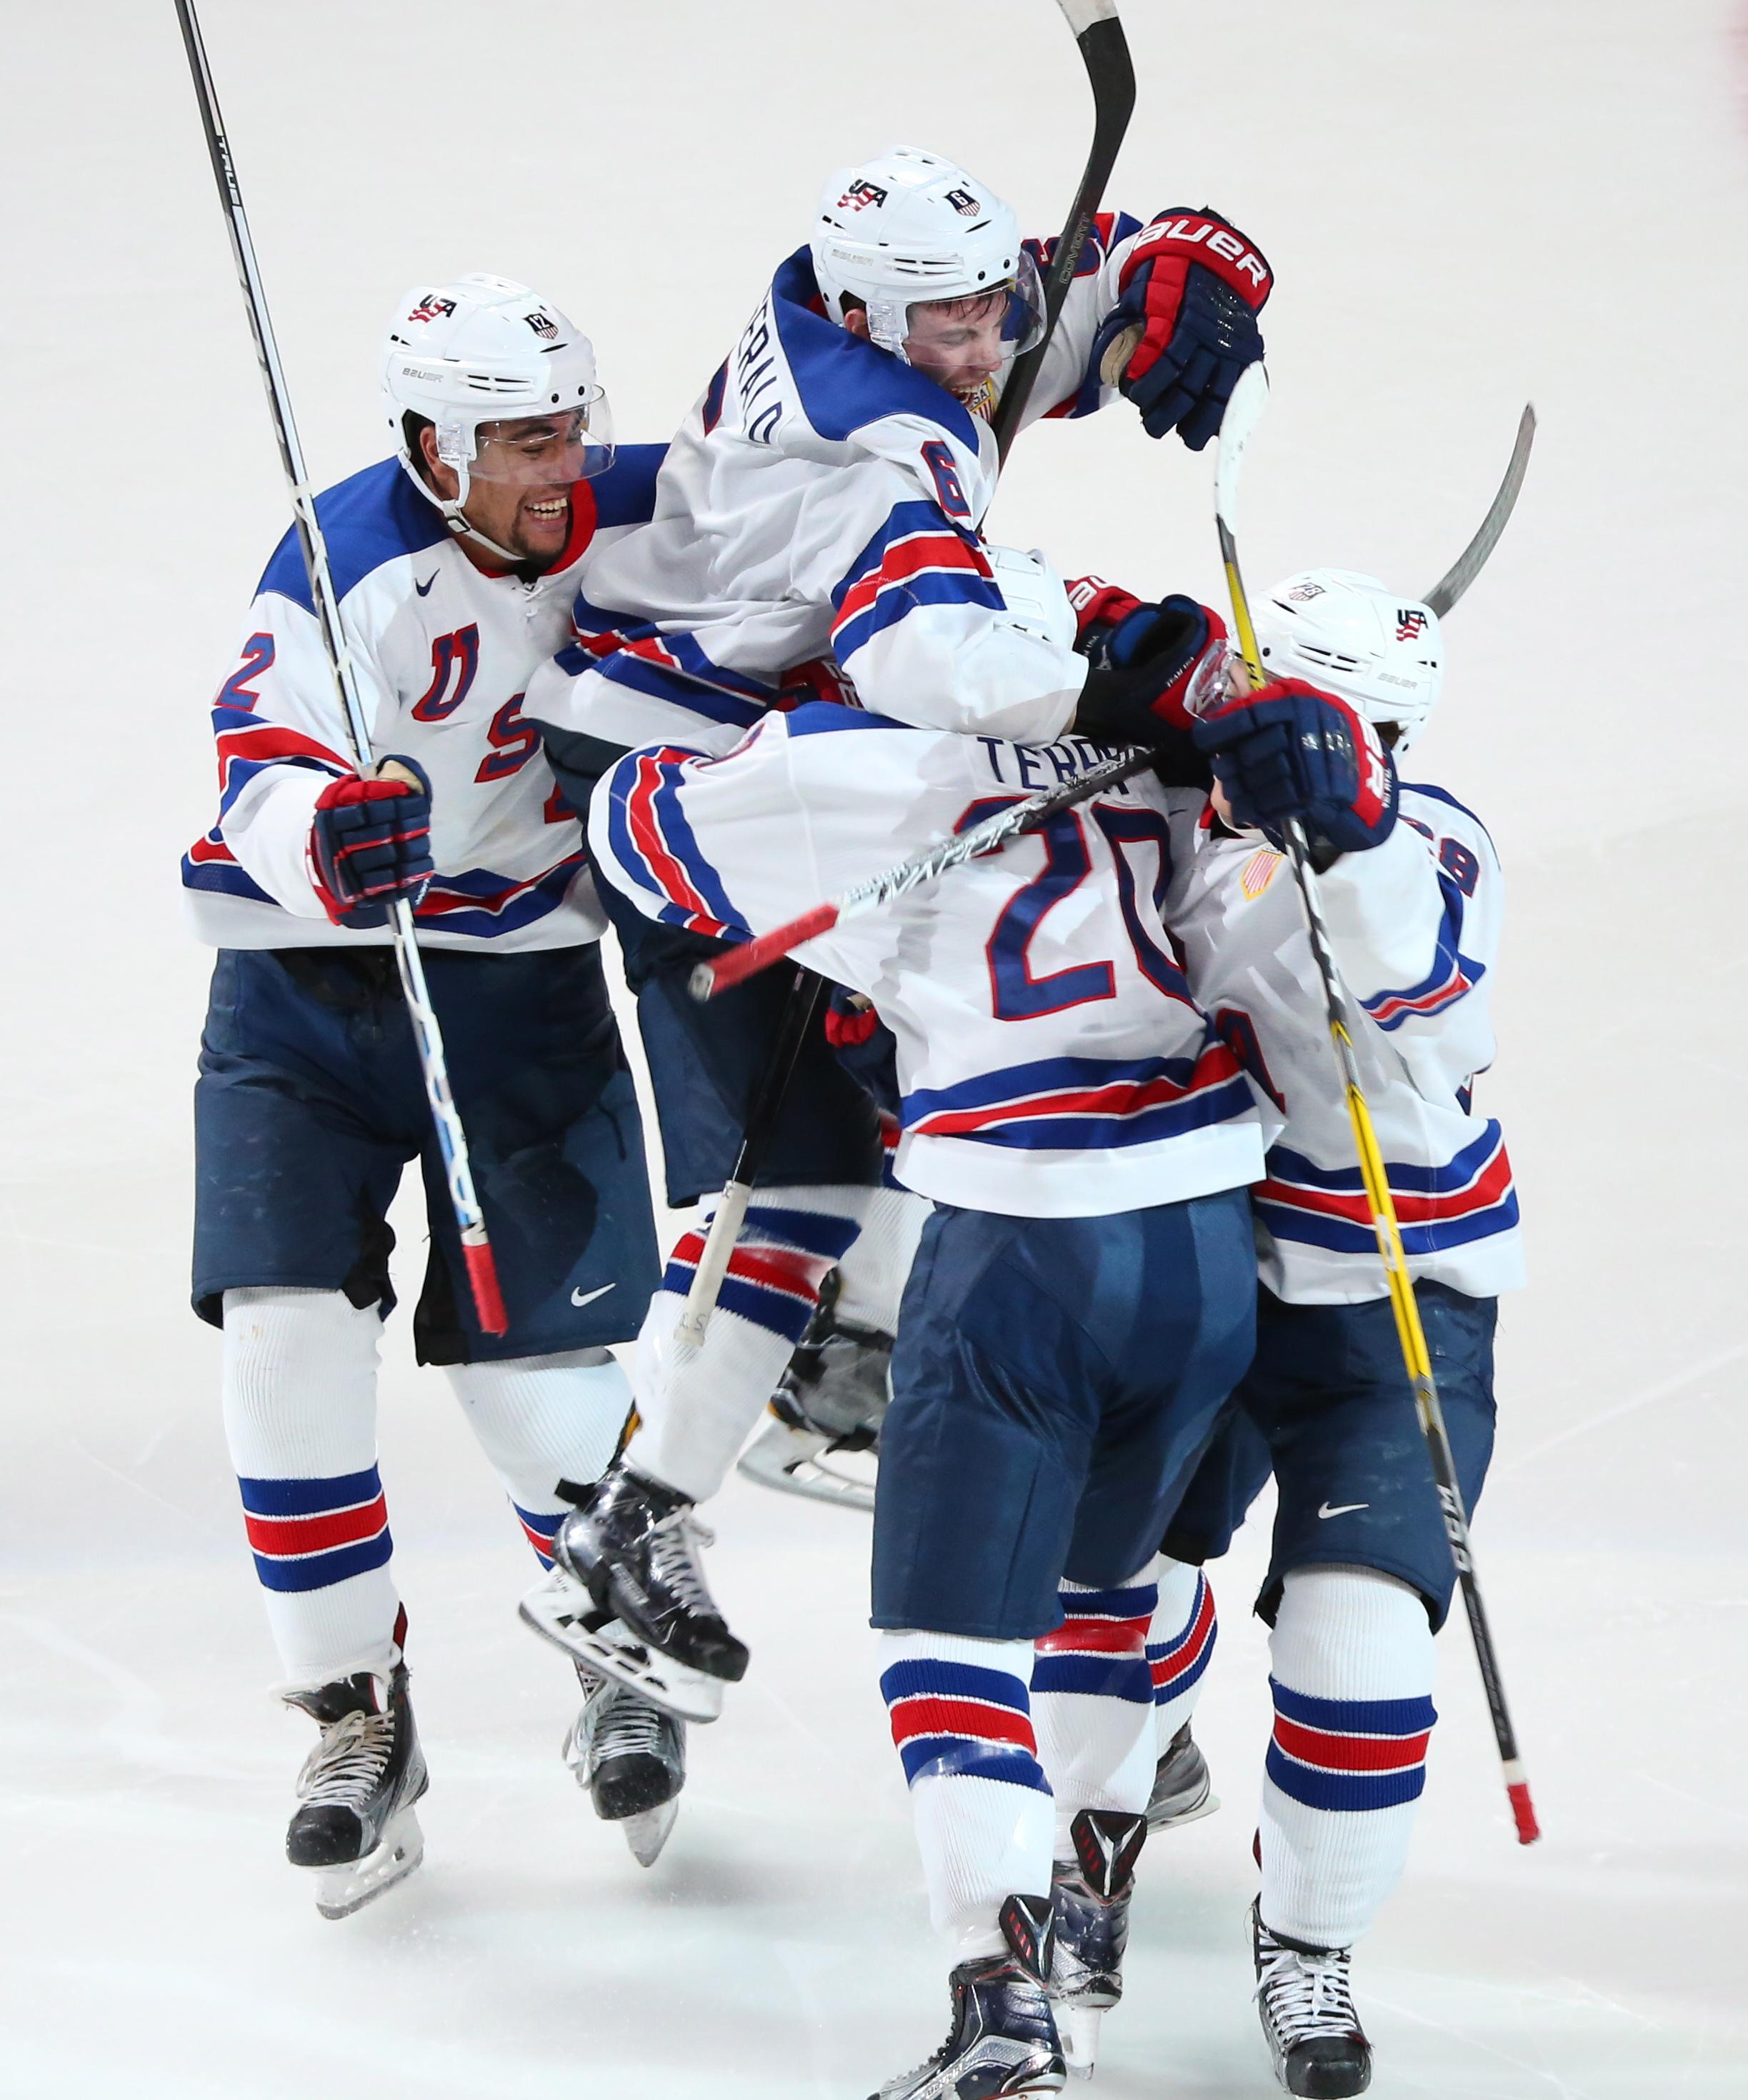 2017 IIHF World Junior Championship semifinal: USA 4 - 3 Russia